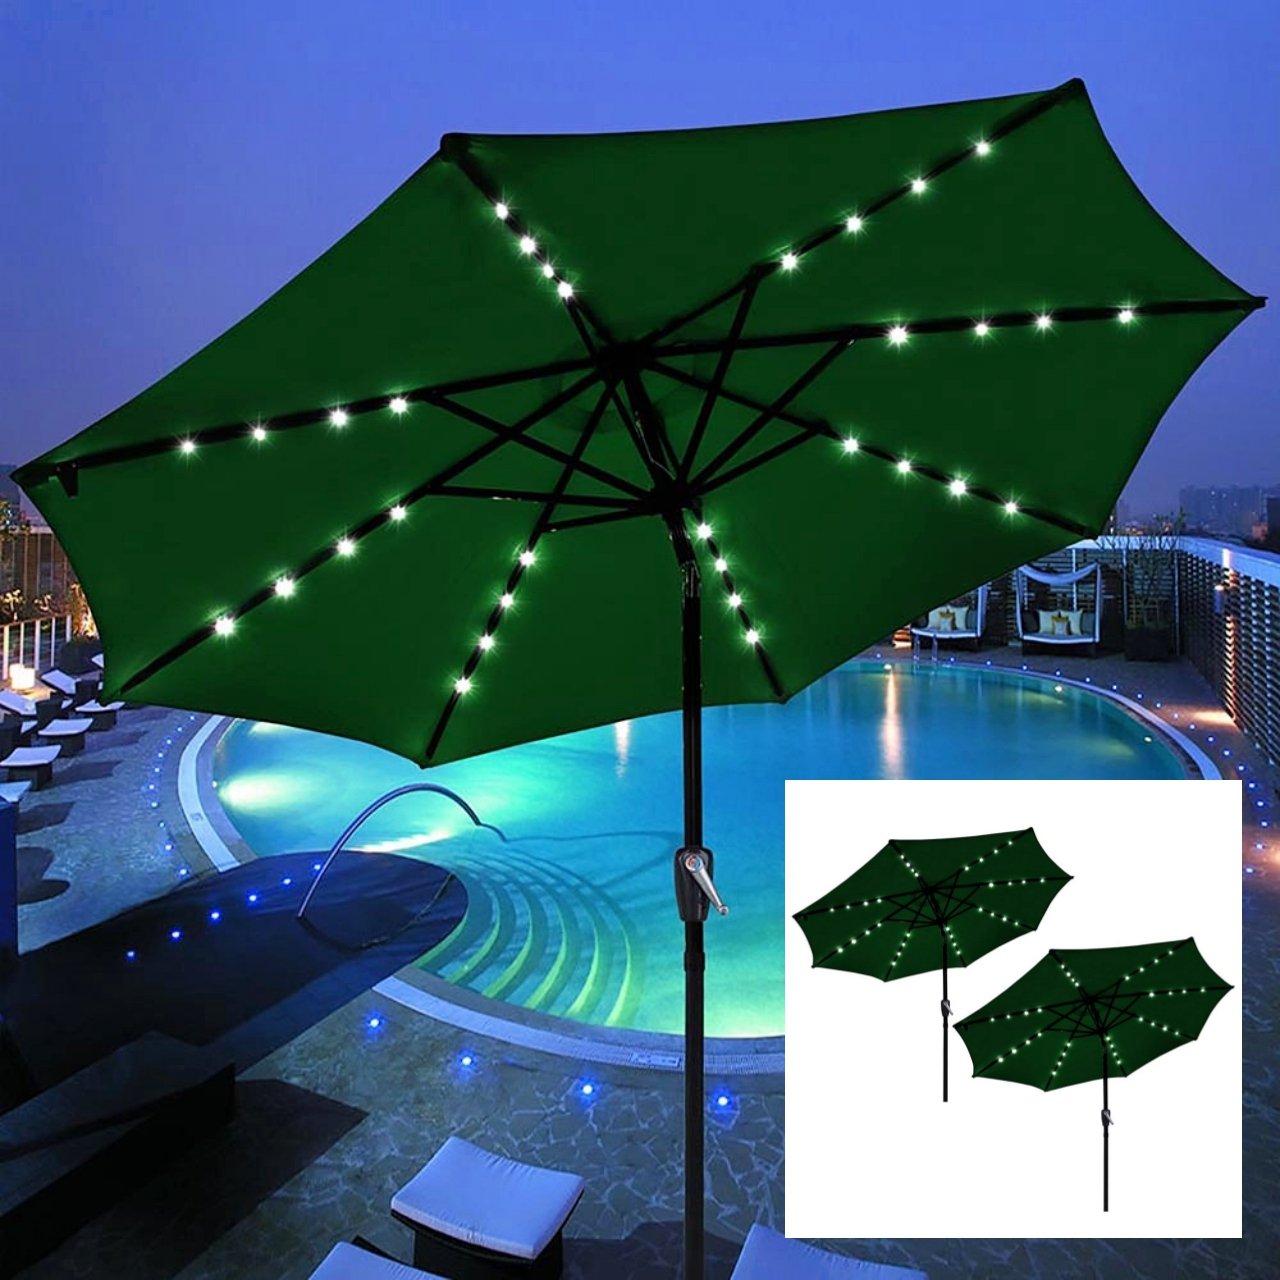 Set of 2 / 9' Outdoor Patio Solar Power LED Aluminium Umbrella Sunshade UV Blocking Tilt & Crank Green #909